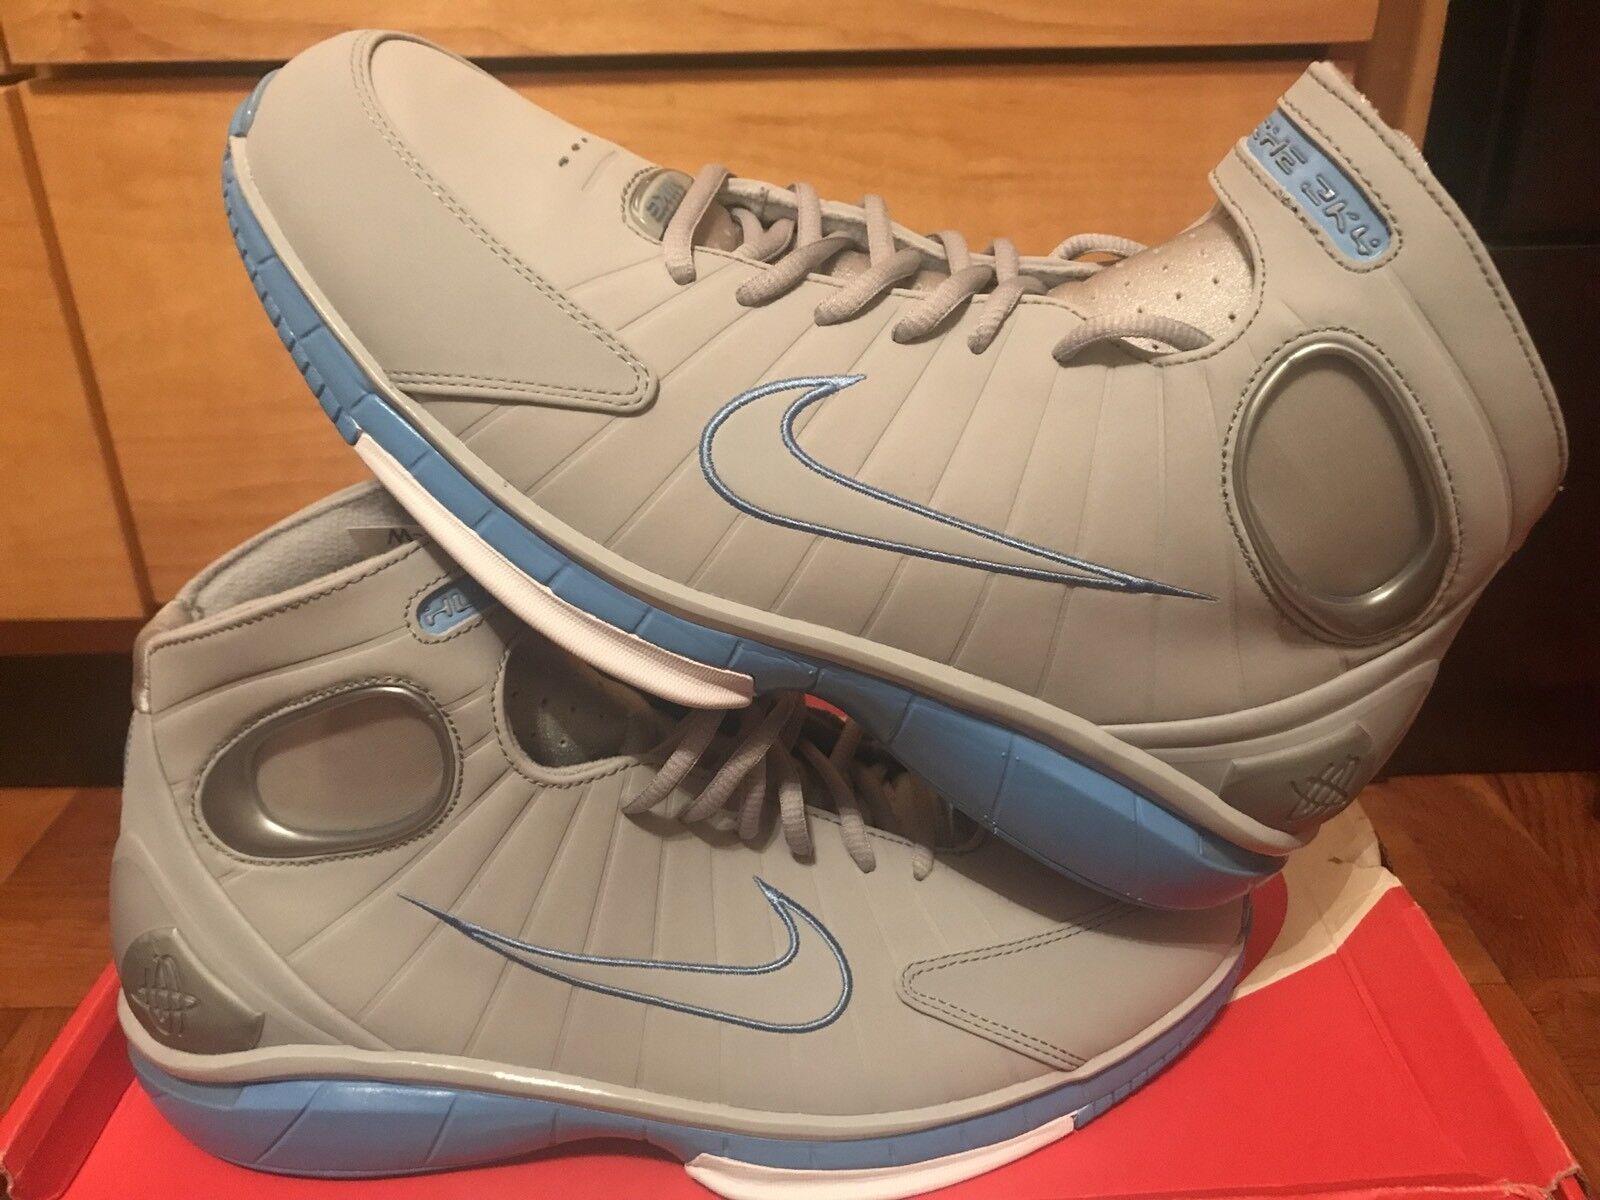 Nike Zoom Huarache 2k4 Kobe Mens Size 9.5 10.5 12 Shoes Wolf Grey 308475 002